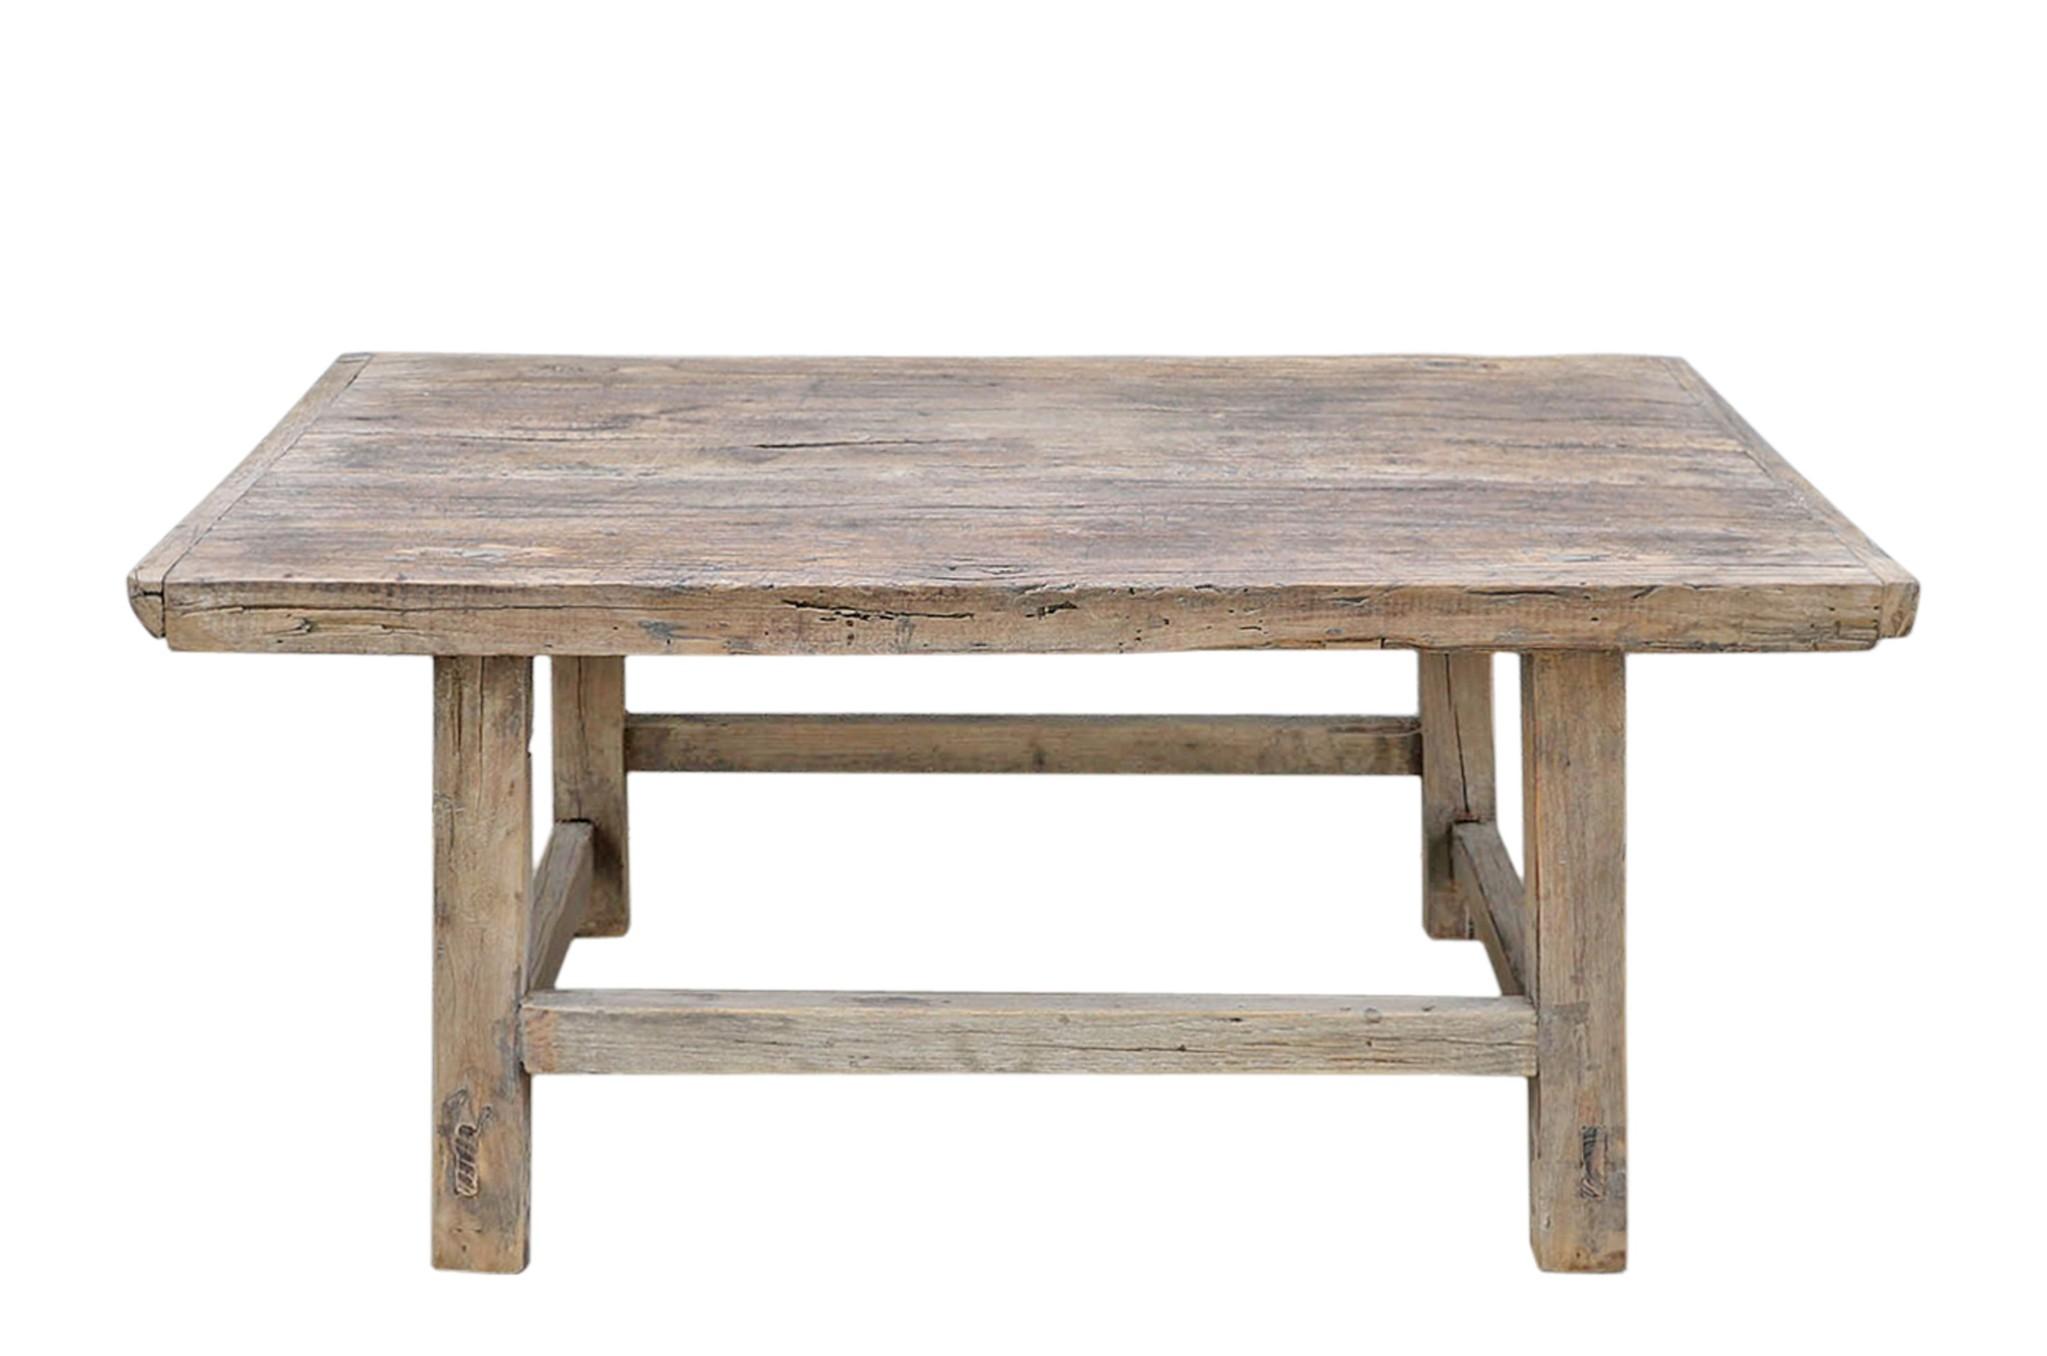 Maisons Origines Raw wood coffee table - 92x57xH42cm - recycled Elm wood